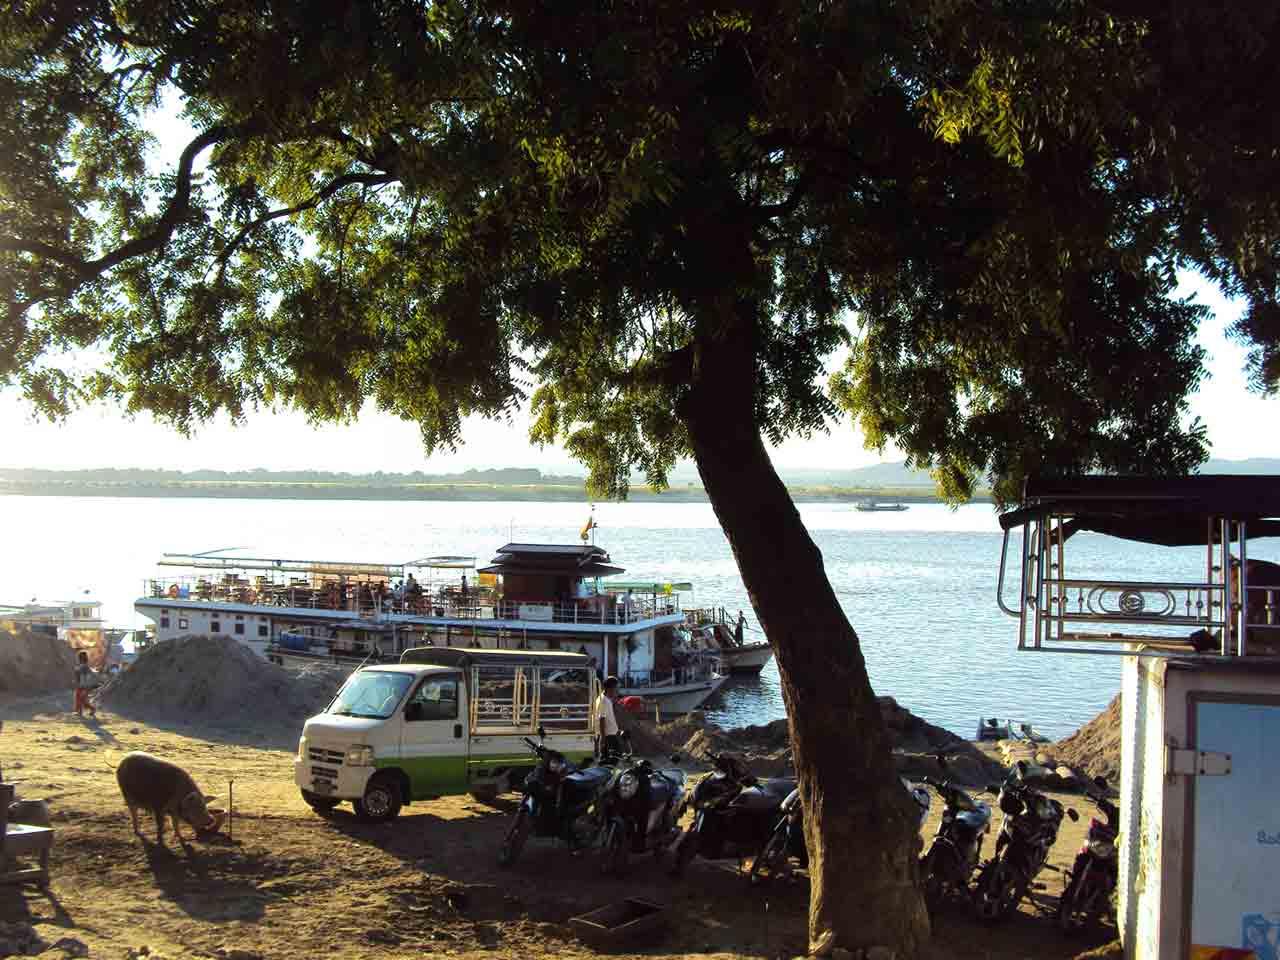 Irrawaddy shore in Mandalay